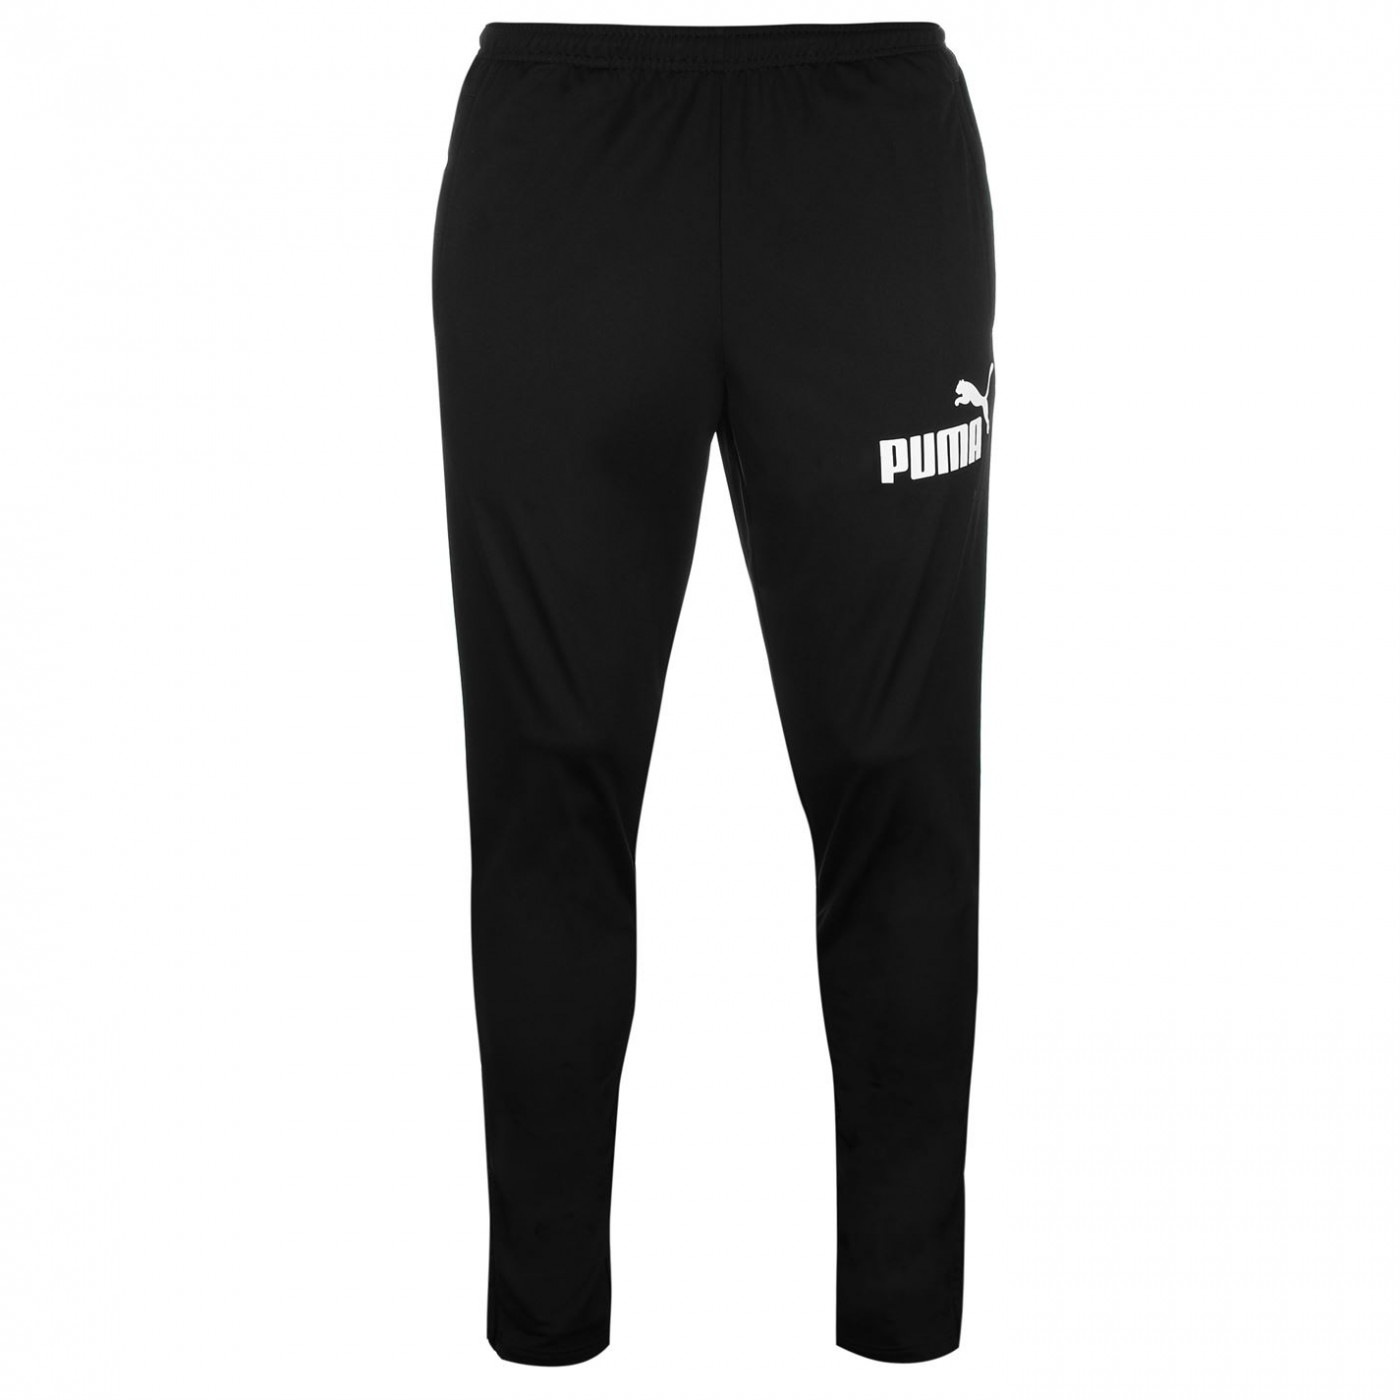 Puma Tapered Pants Mens